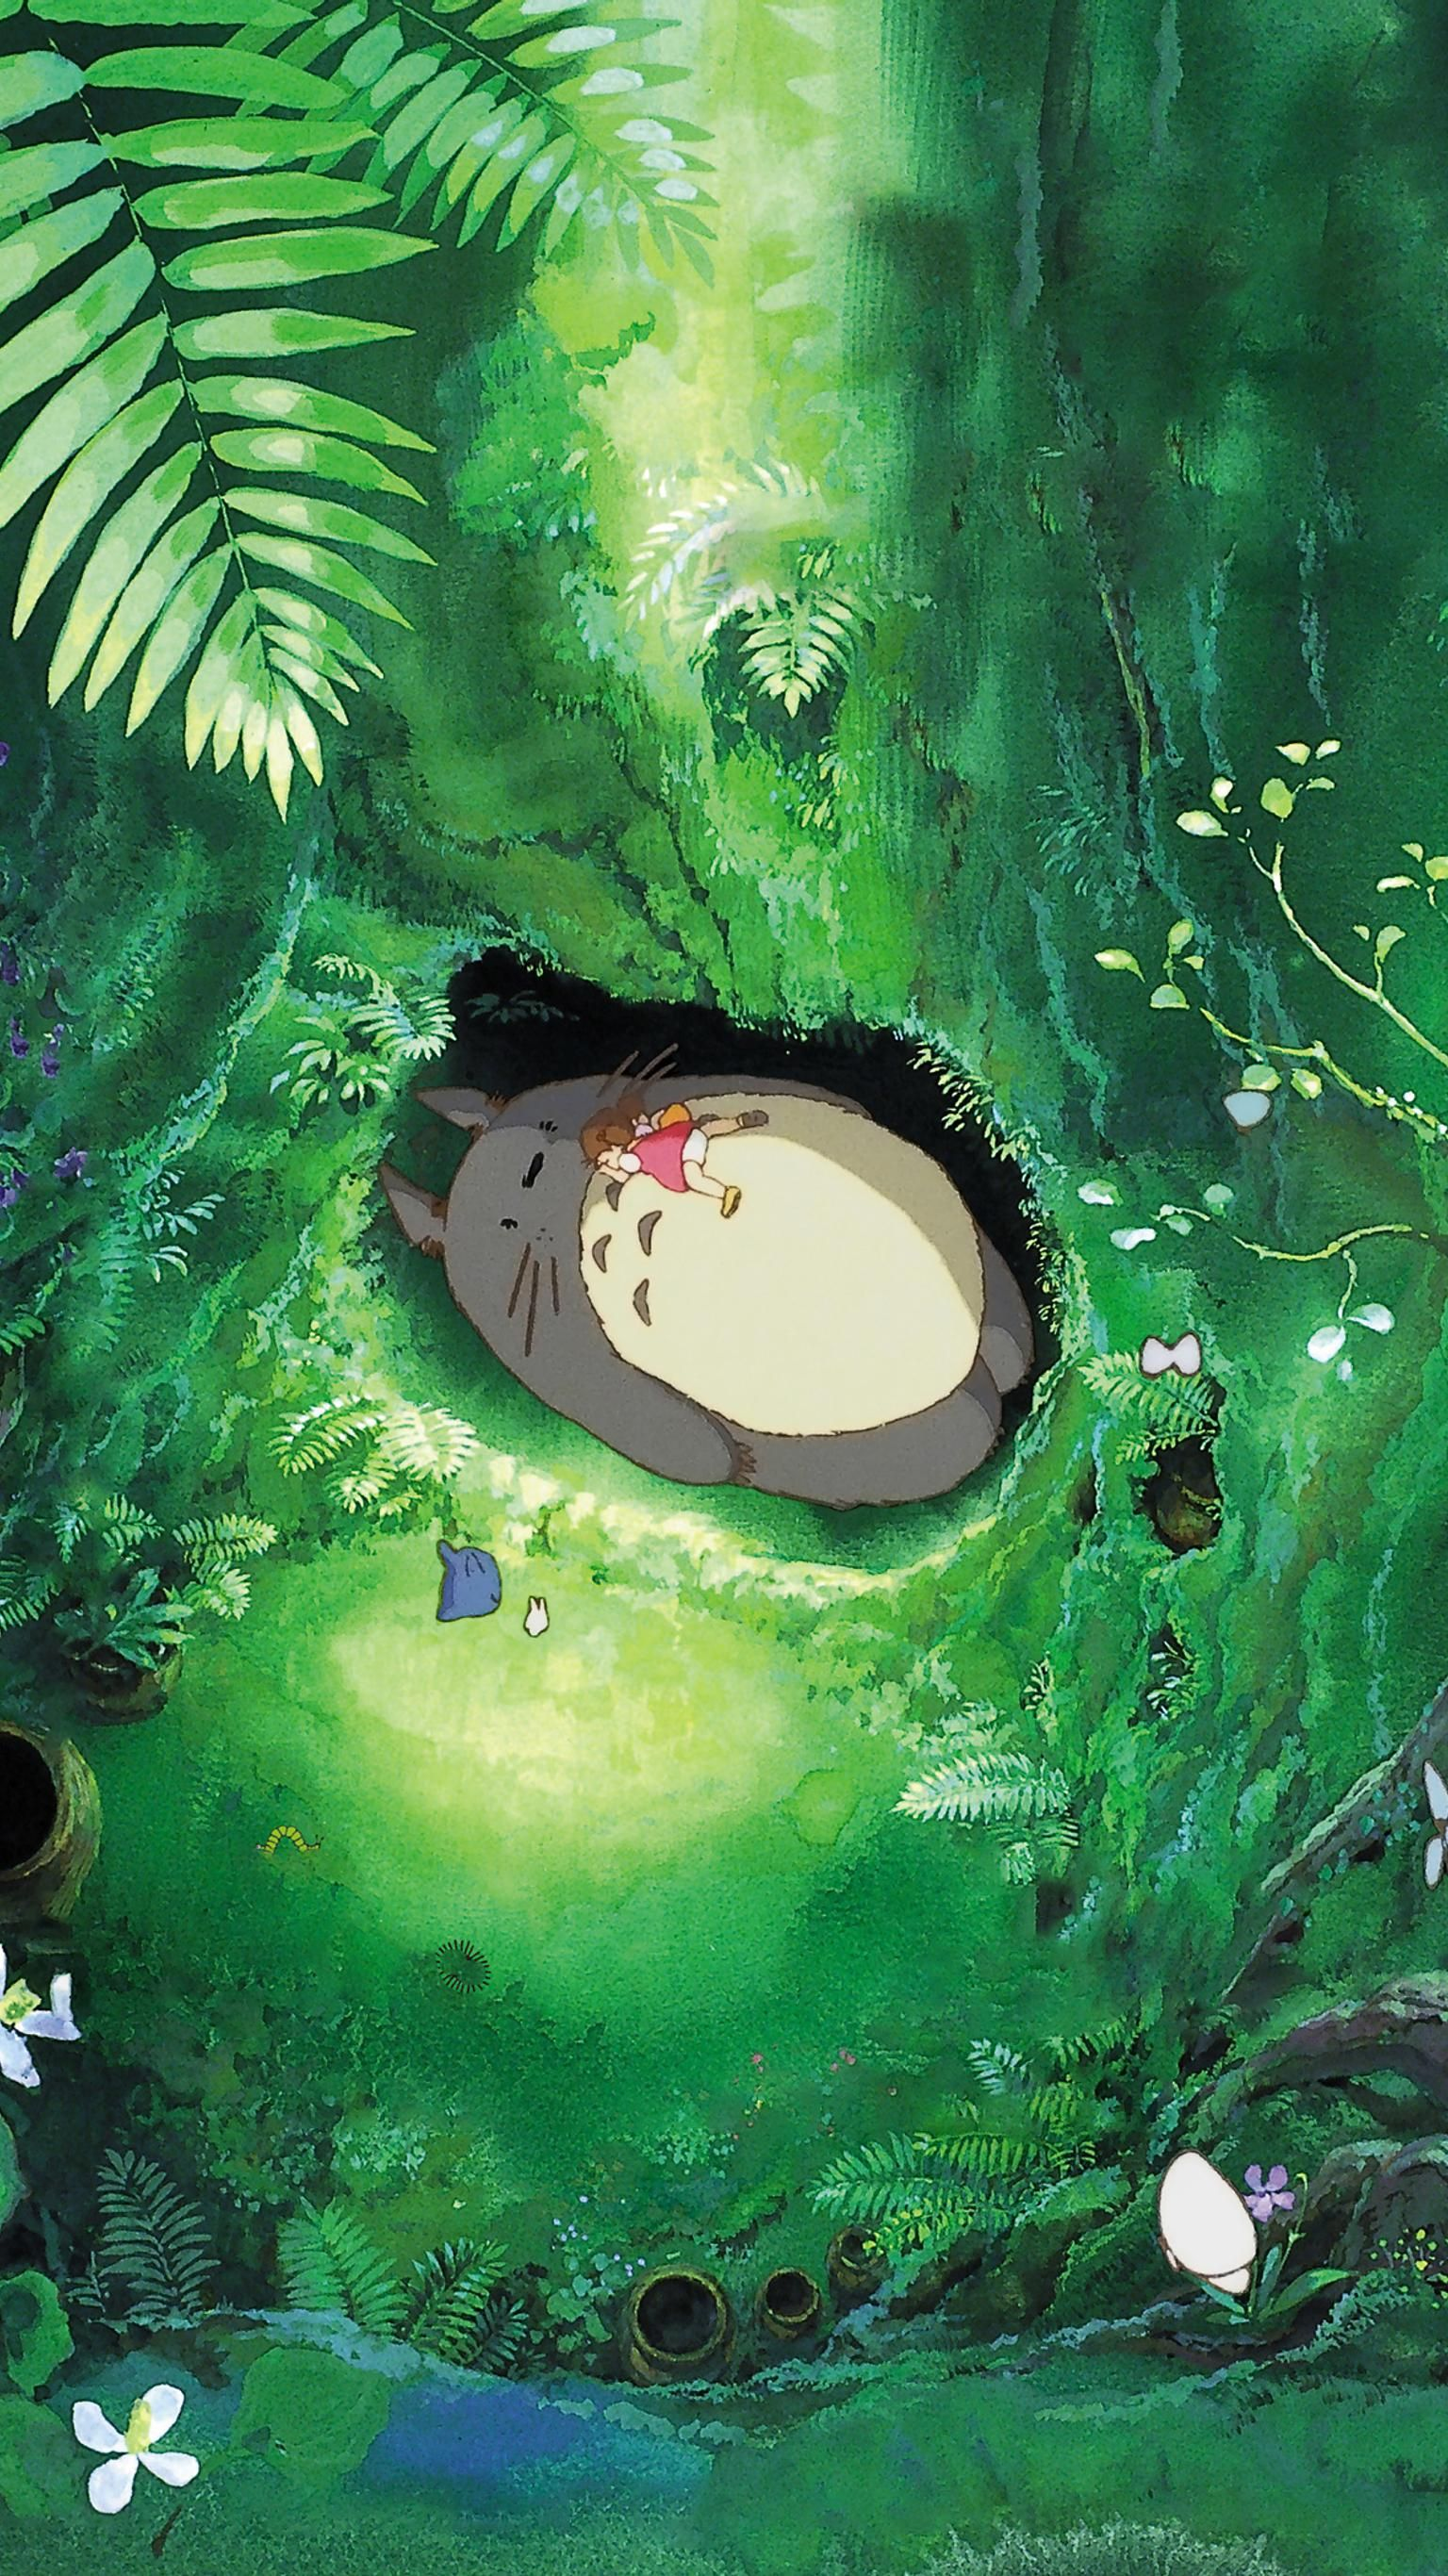 My Neighbor Totoro (1988) Phone Wallpaper   Moviemania